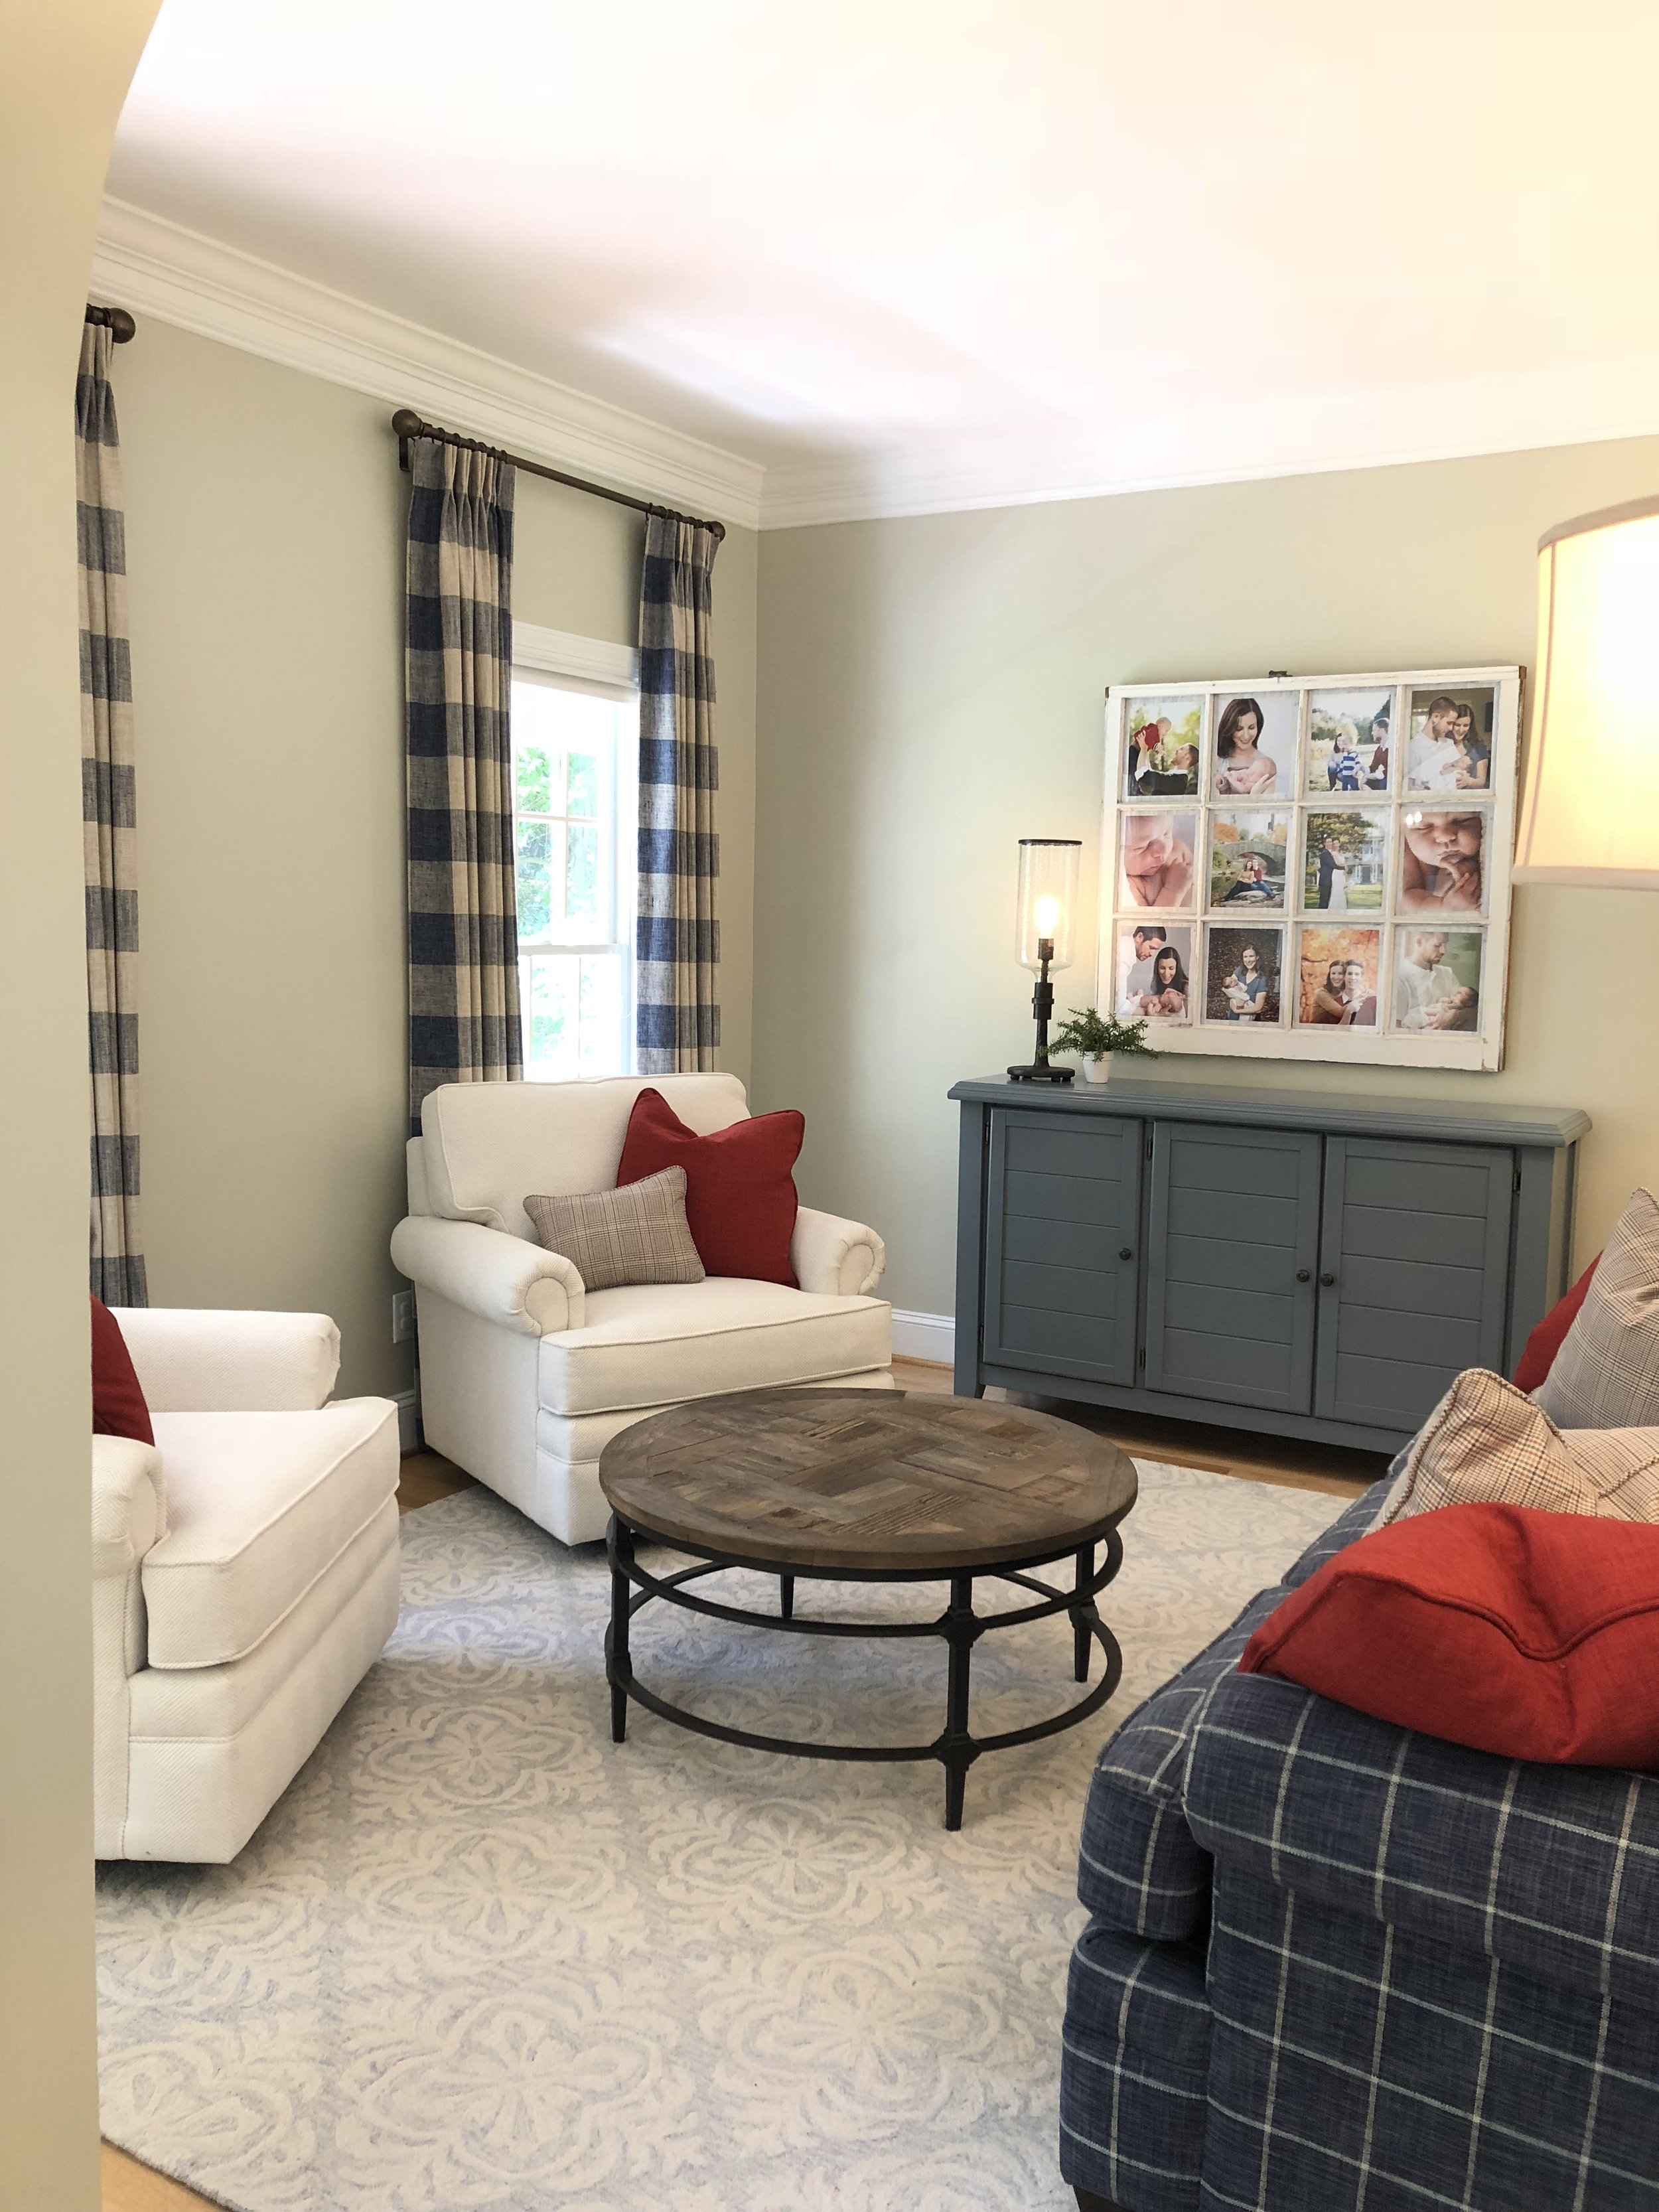 Red, White & Blue Room